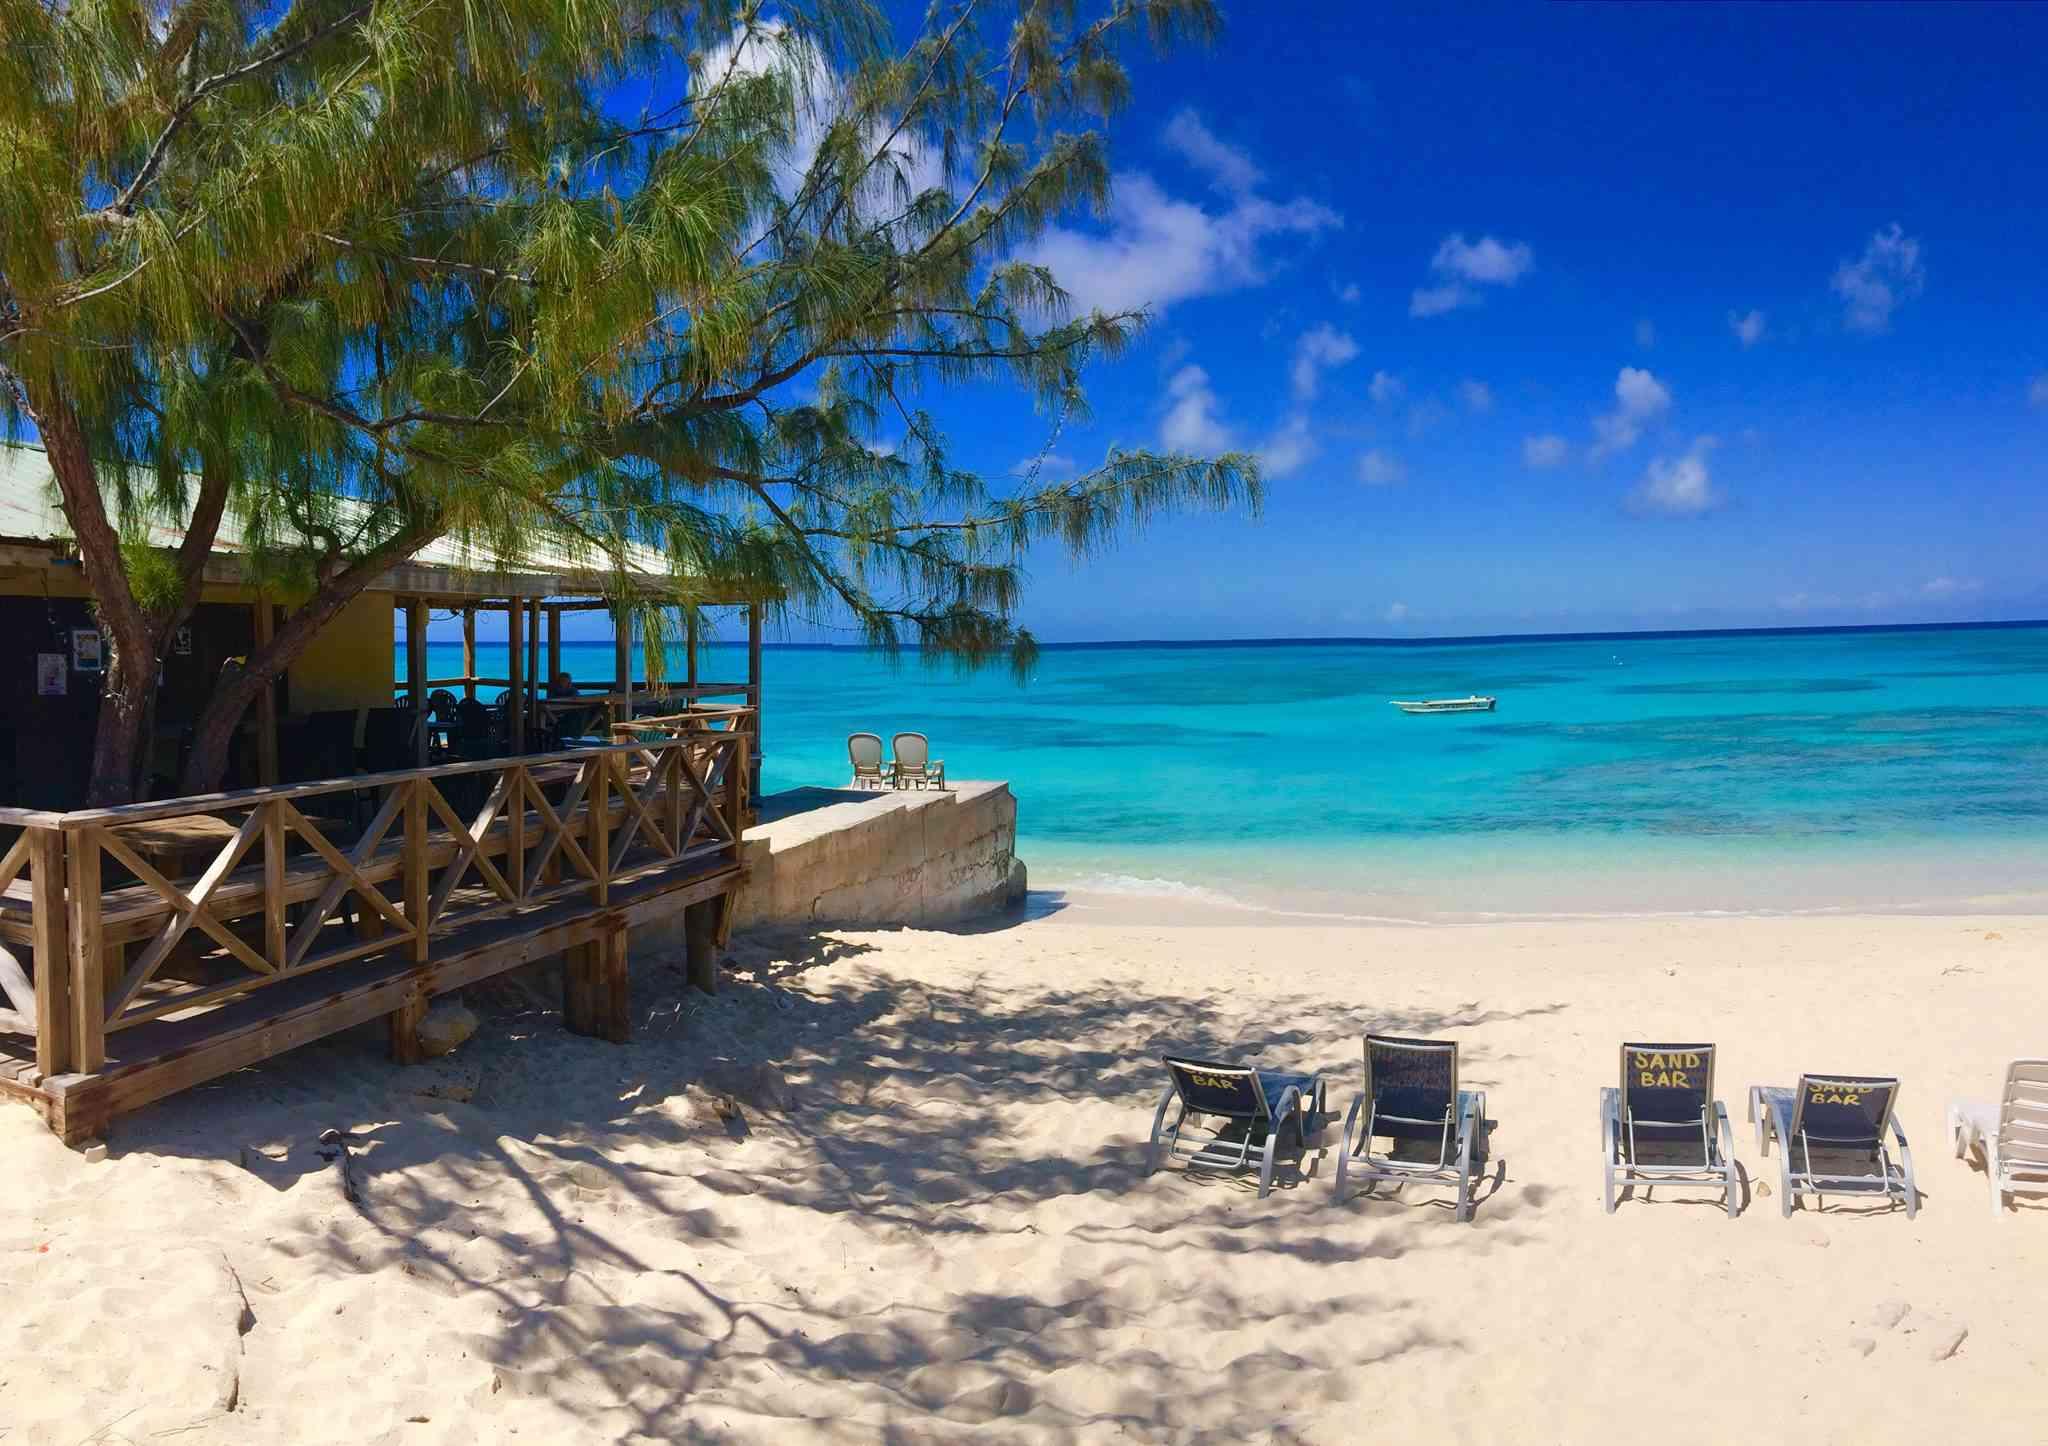 white sand beach with a restaurant and beach chairs